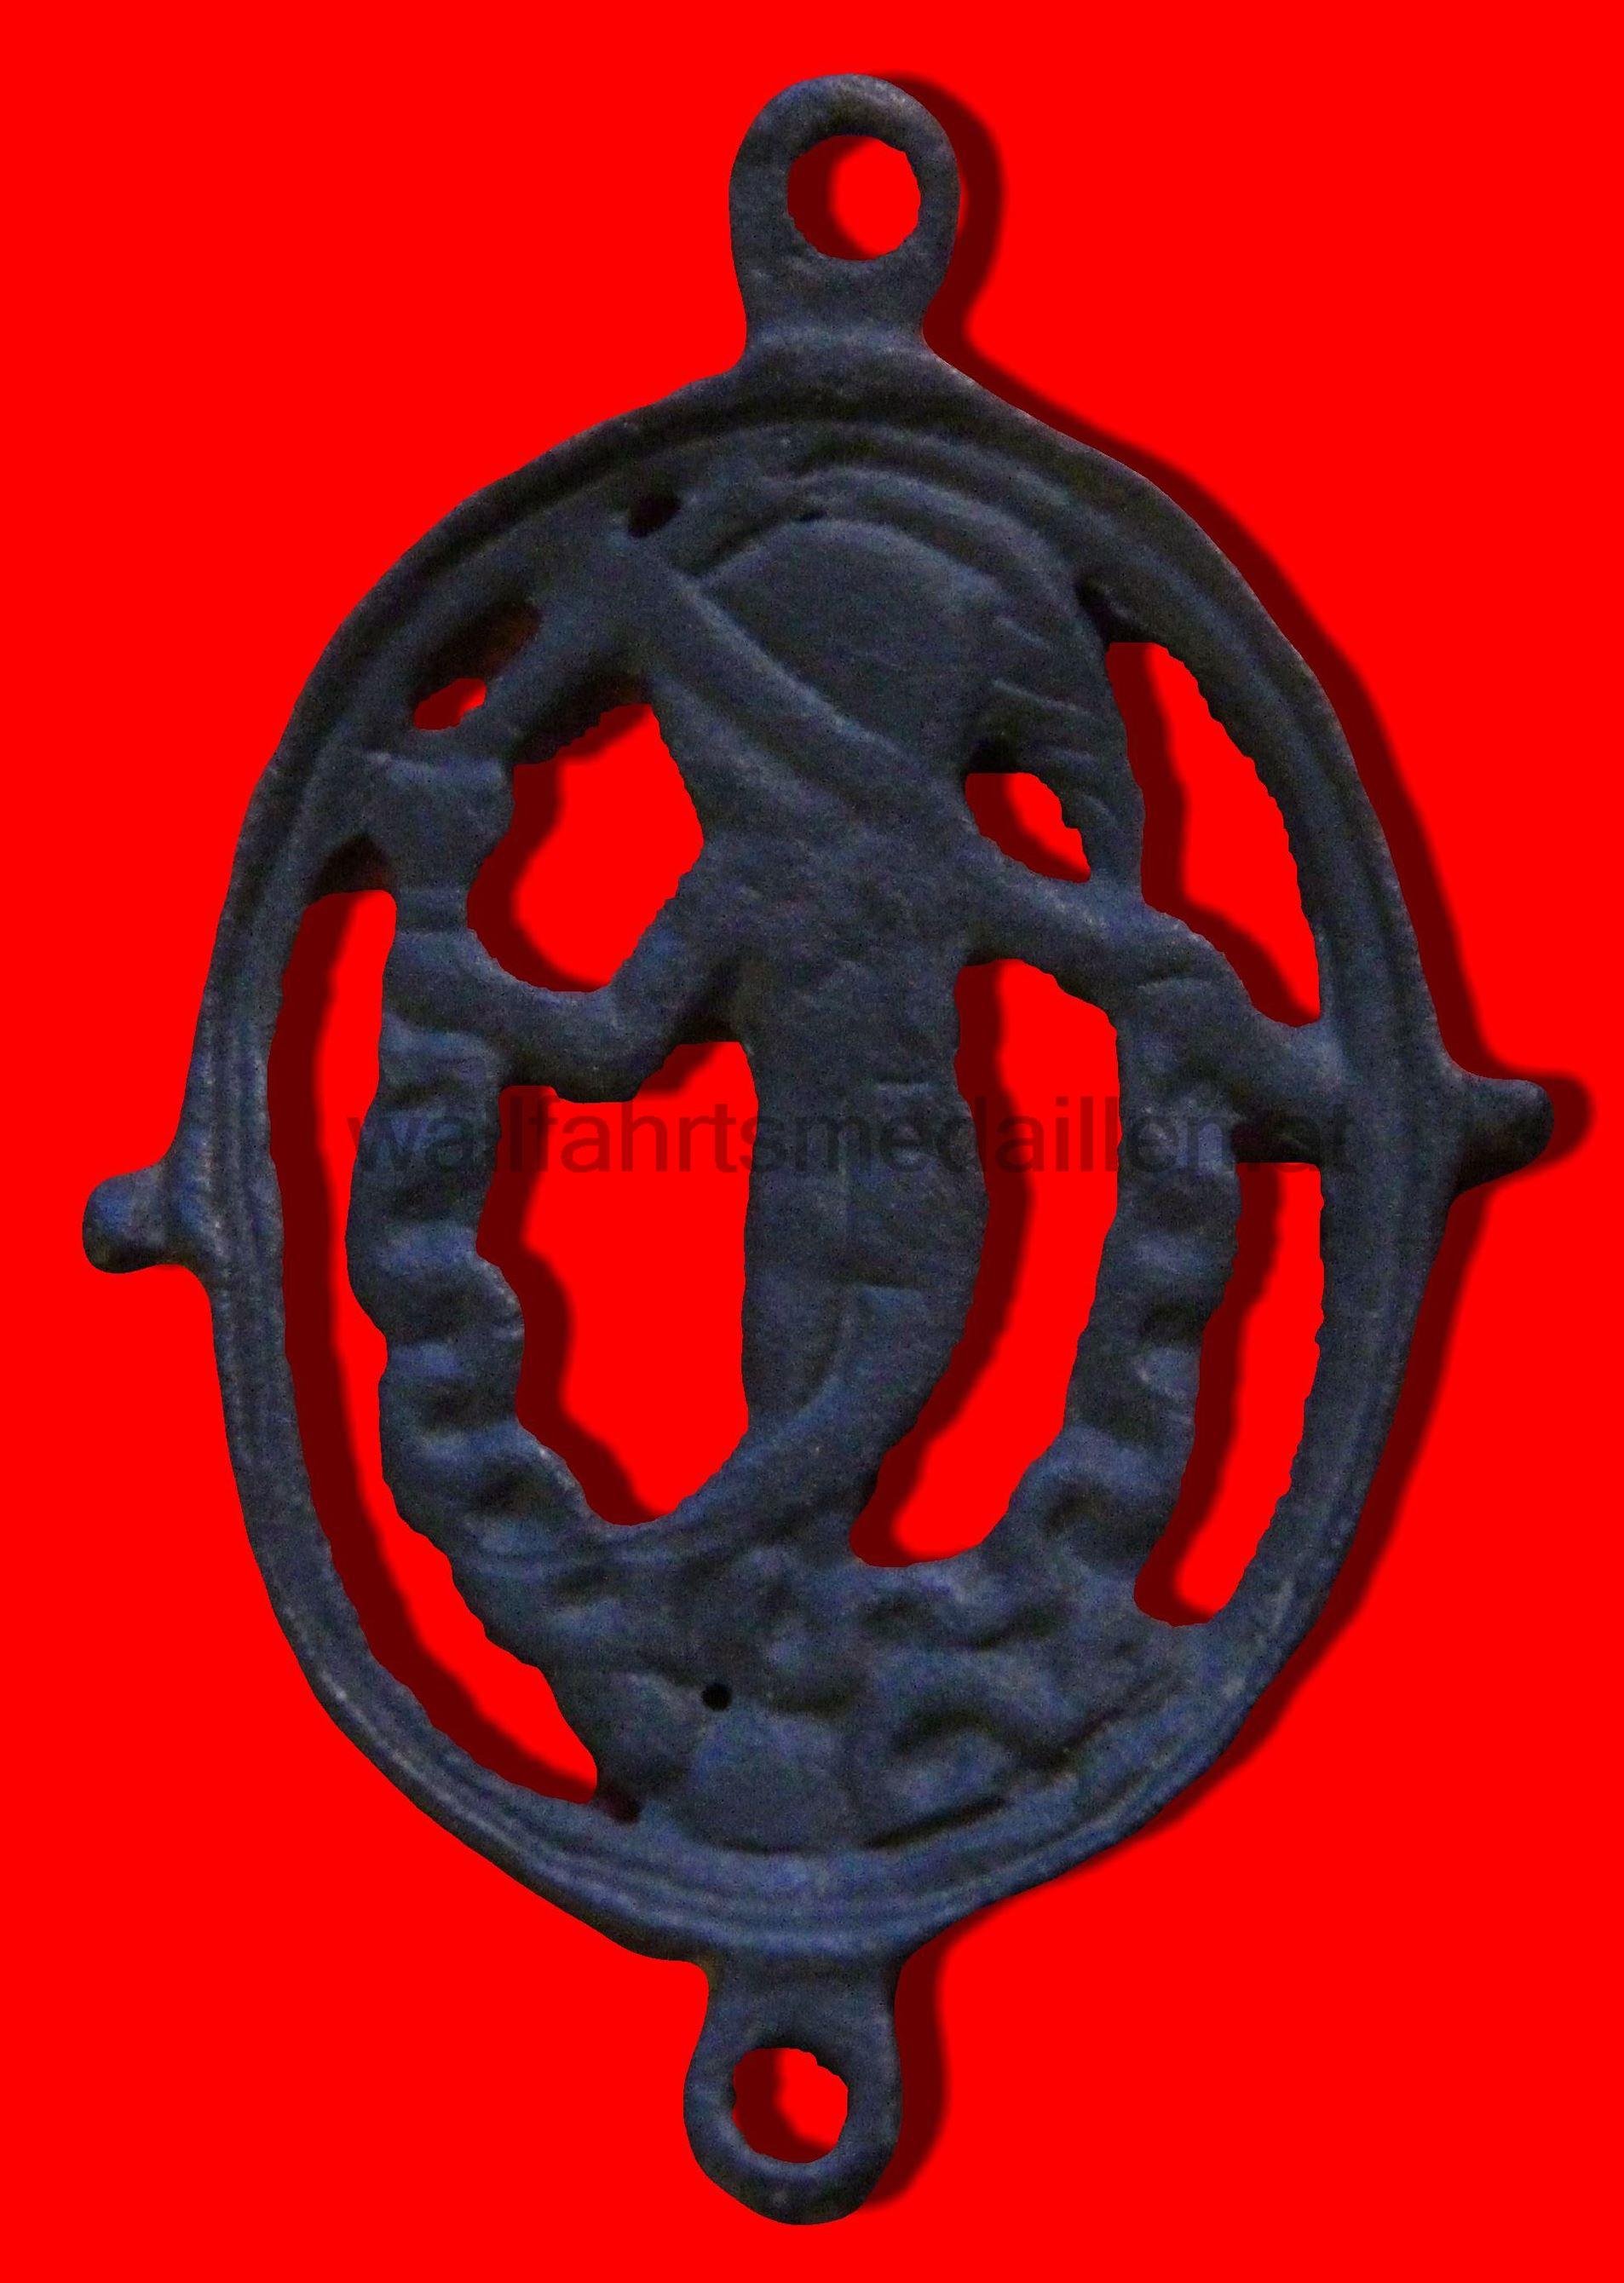 Figurale Medaille gefertigt als Rosenkranz - Verbindungsmedaille